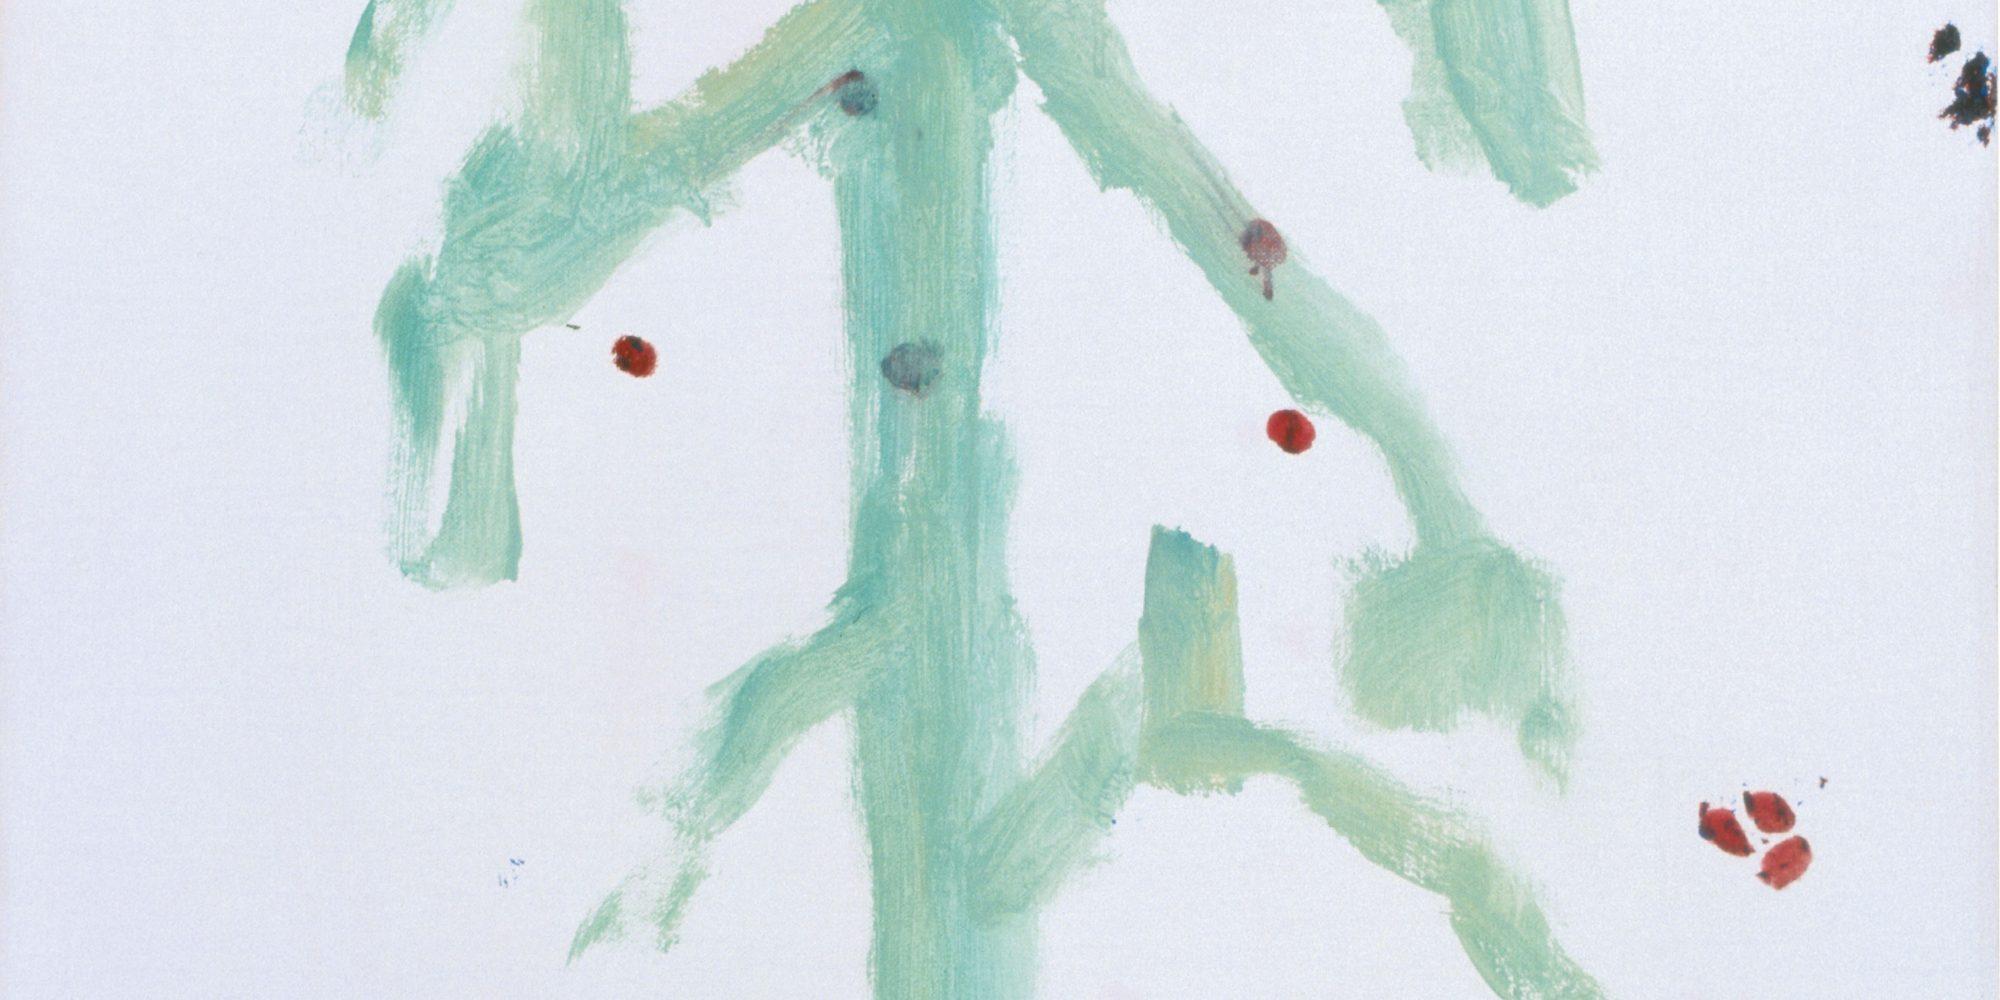 Raoul De Keyser, Séjour, 2001 Öl auf Leinwand, 71 x 50 cm © Familie Raoul De Keyser | SABAM Belgien 2018, Sammlung Jin Sato, Foto: Felix Tirry